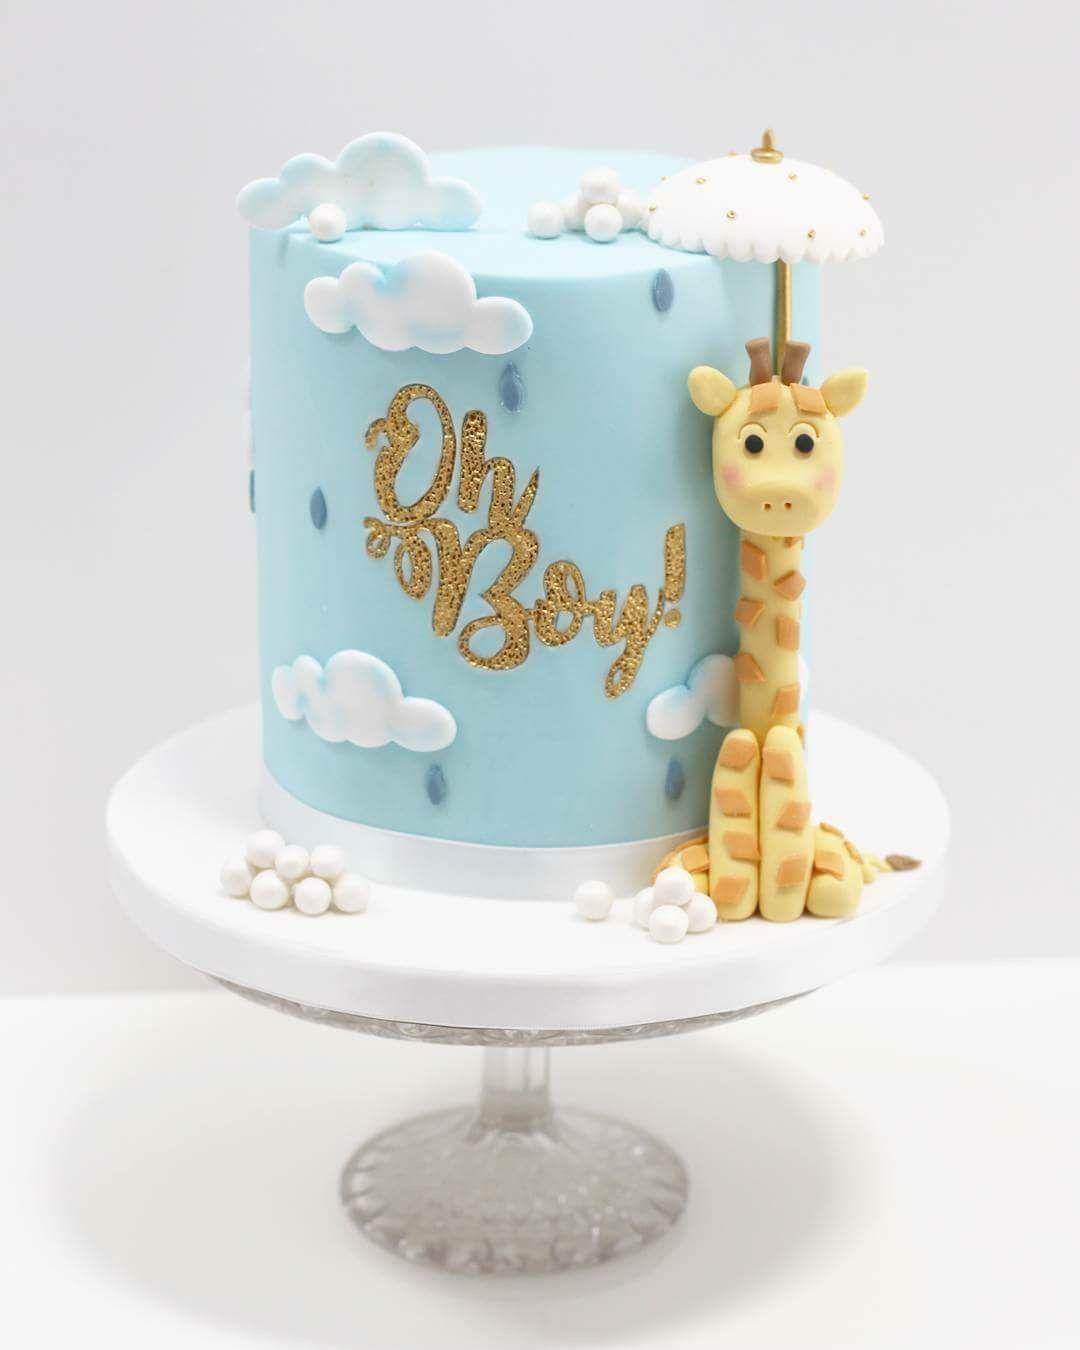 Giraffe Cakes By Jodi On ~Baby Blue Shower~